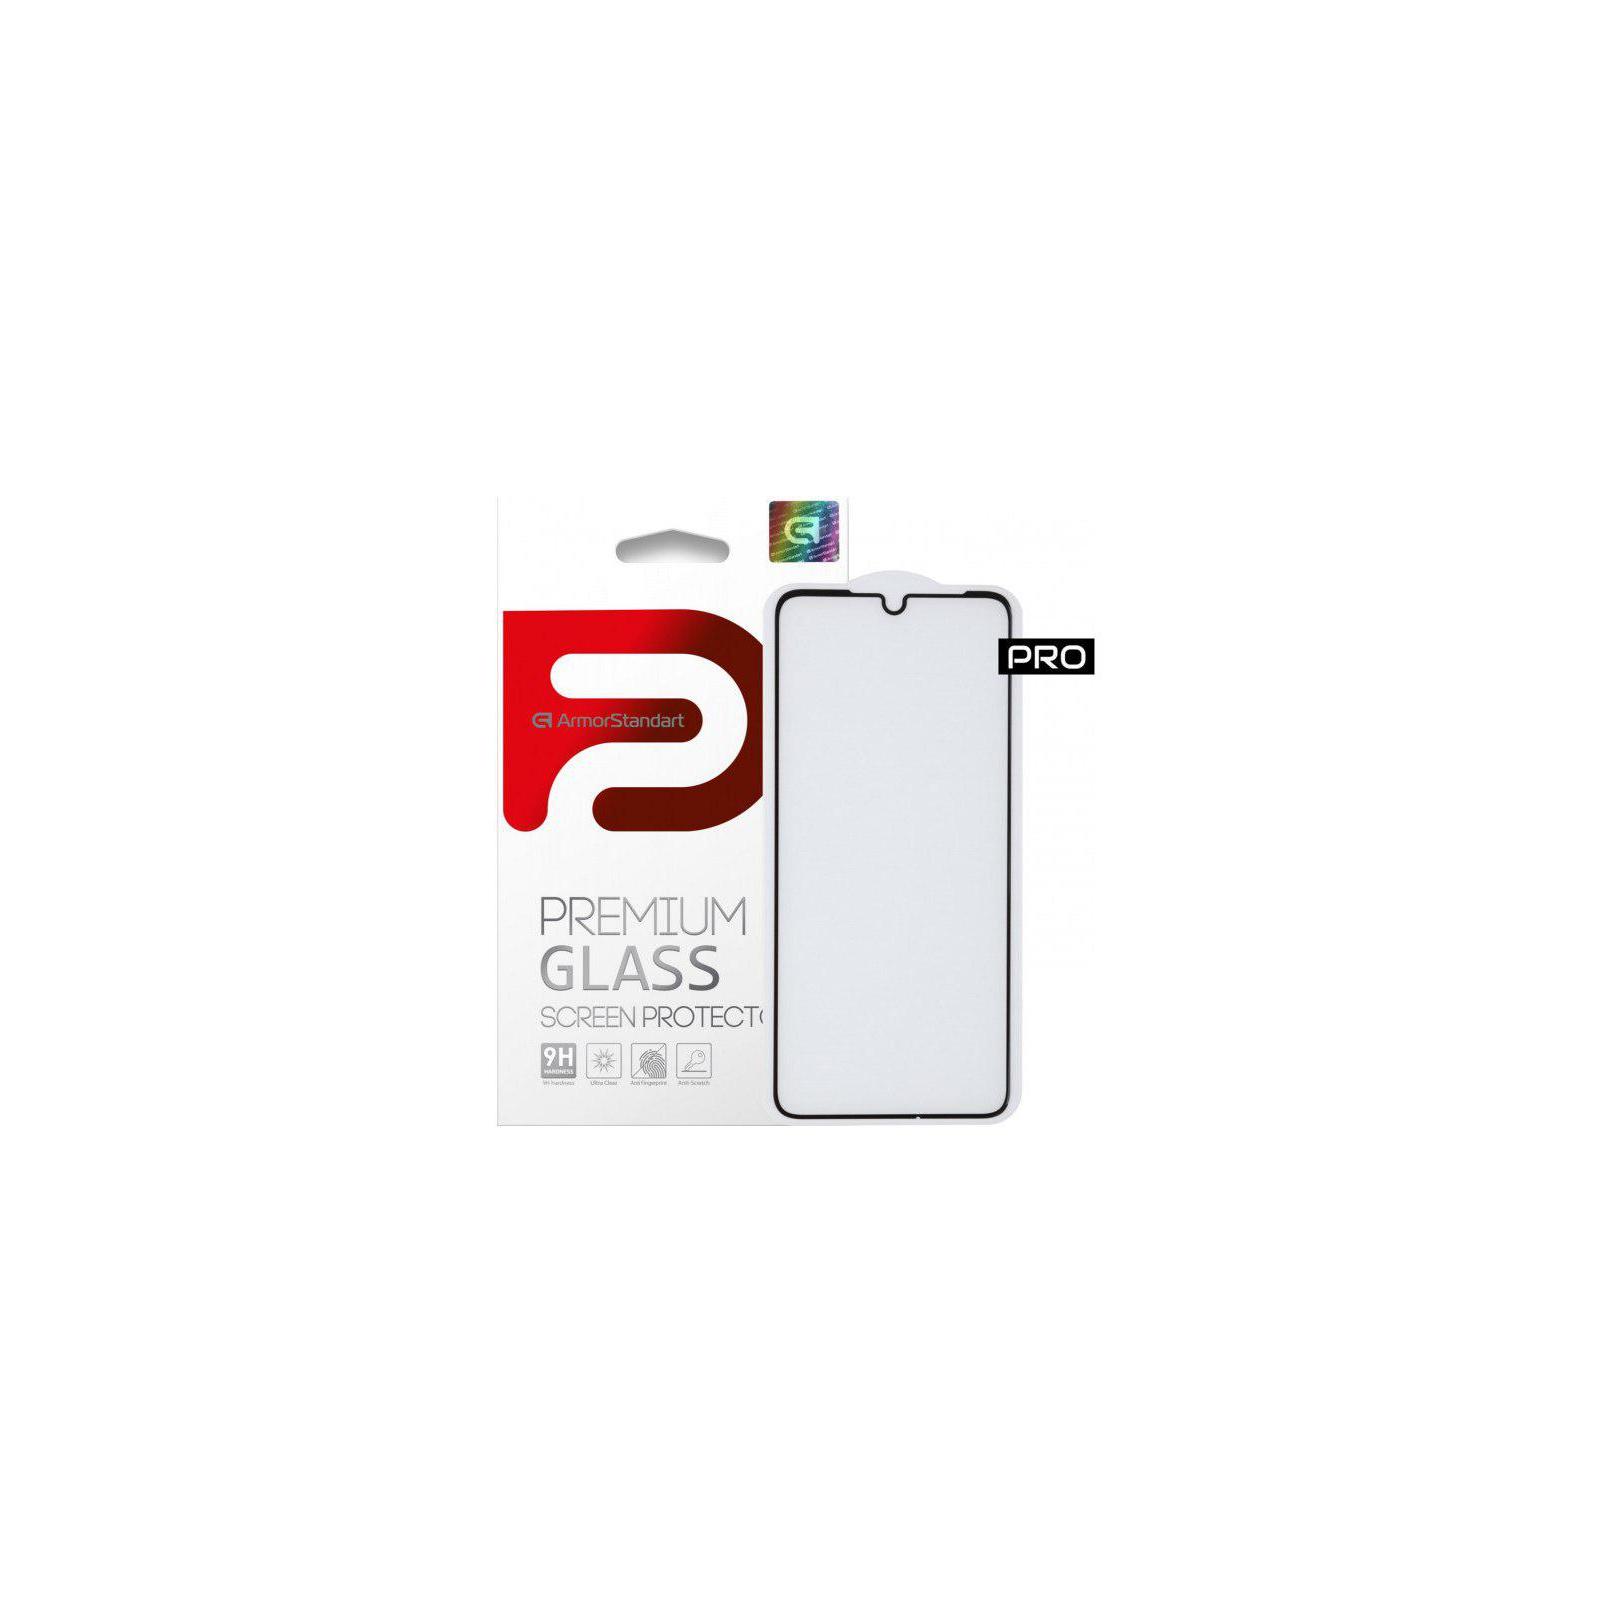 Стекло защитное Armorstandart для Xiaomi Redmi Note 8 Black (ARM55481-GPR-BK)